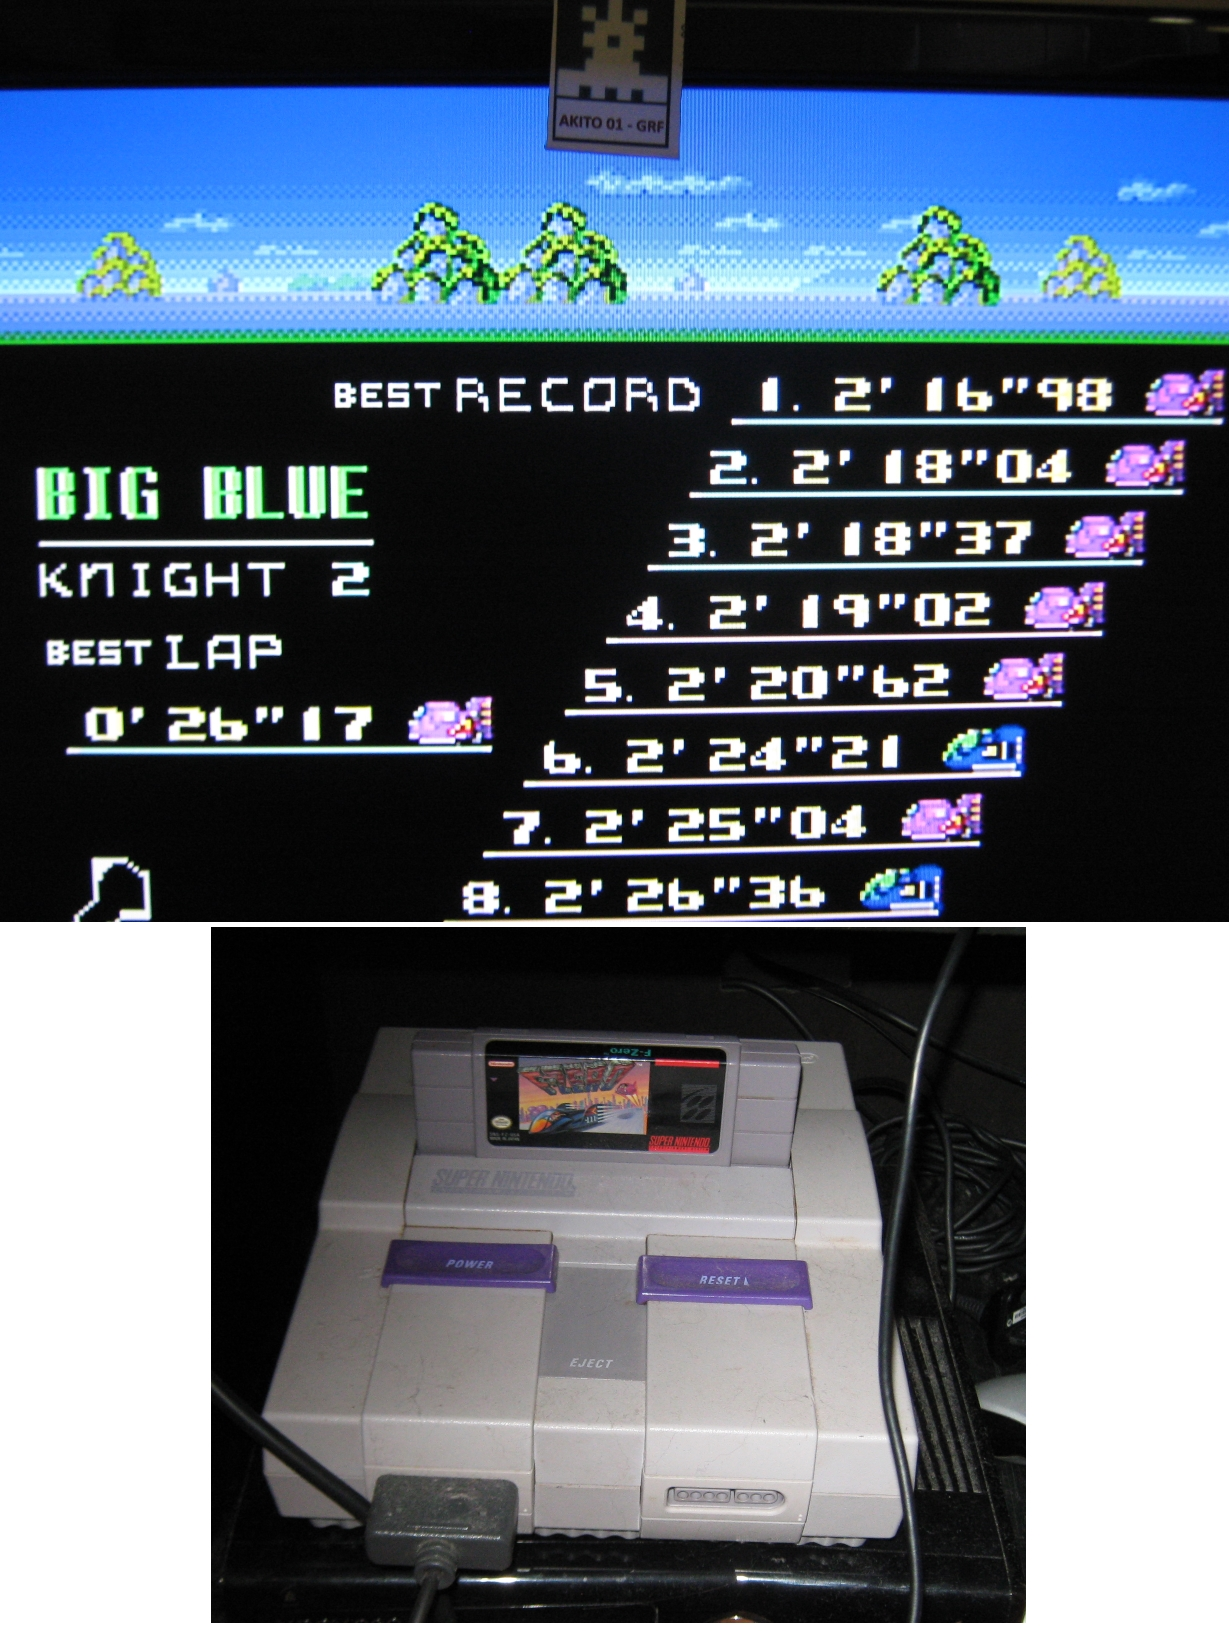 F-Zero: Big Blue [Beginner] time of 0:02:16.98